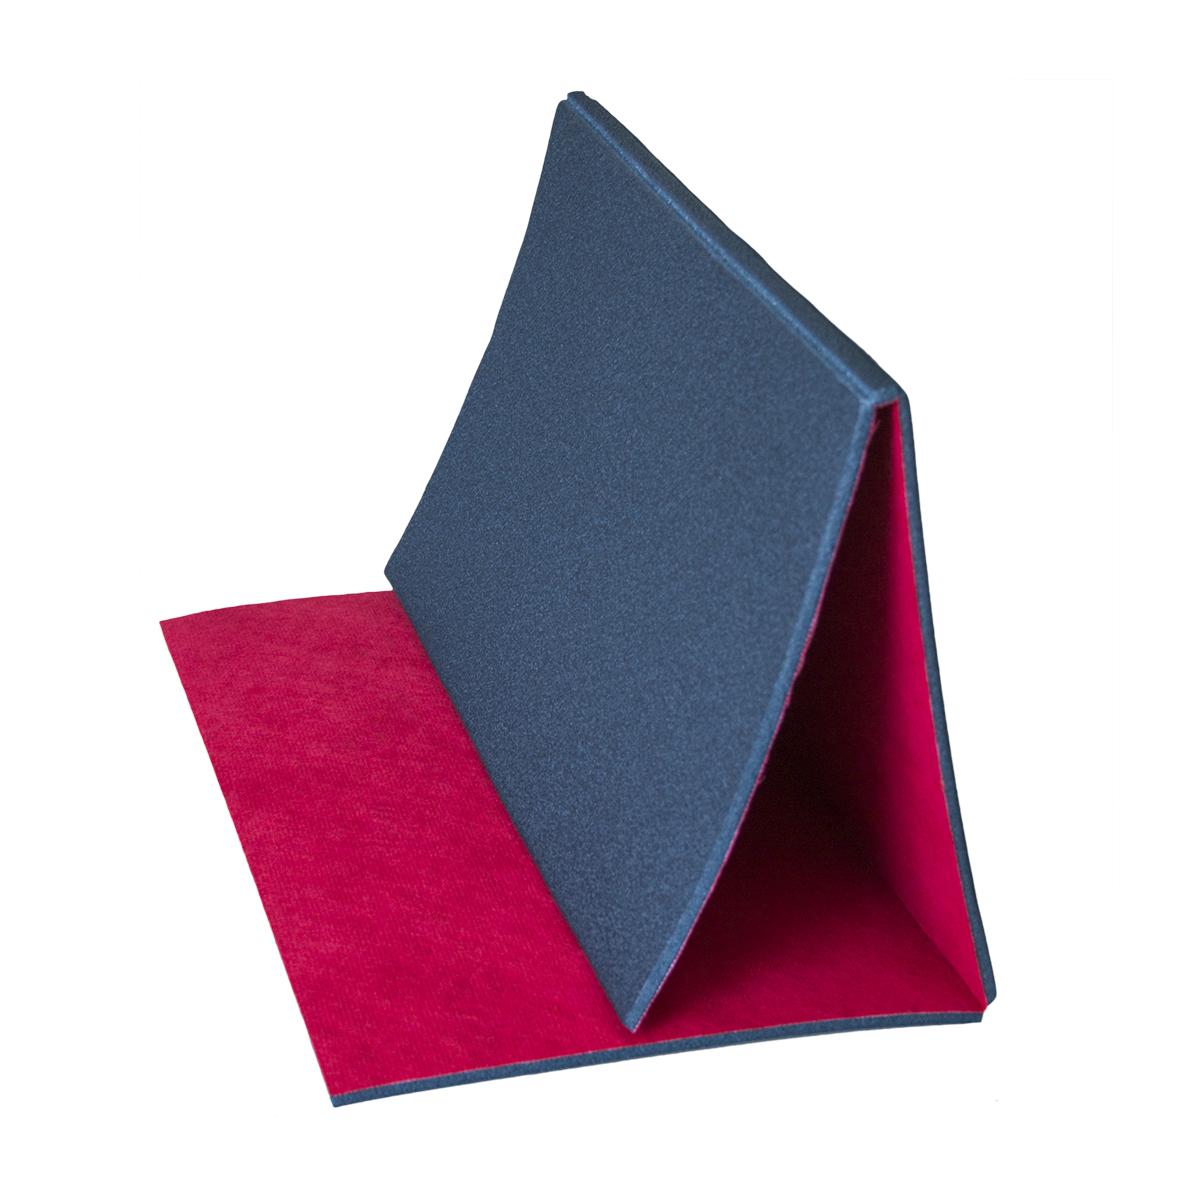 Gymnastická podložka na aerobic 90x52 cm - textilní